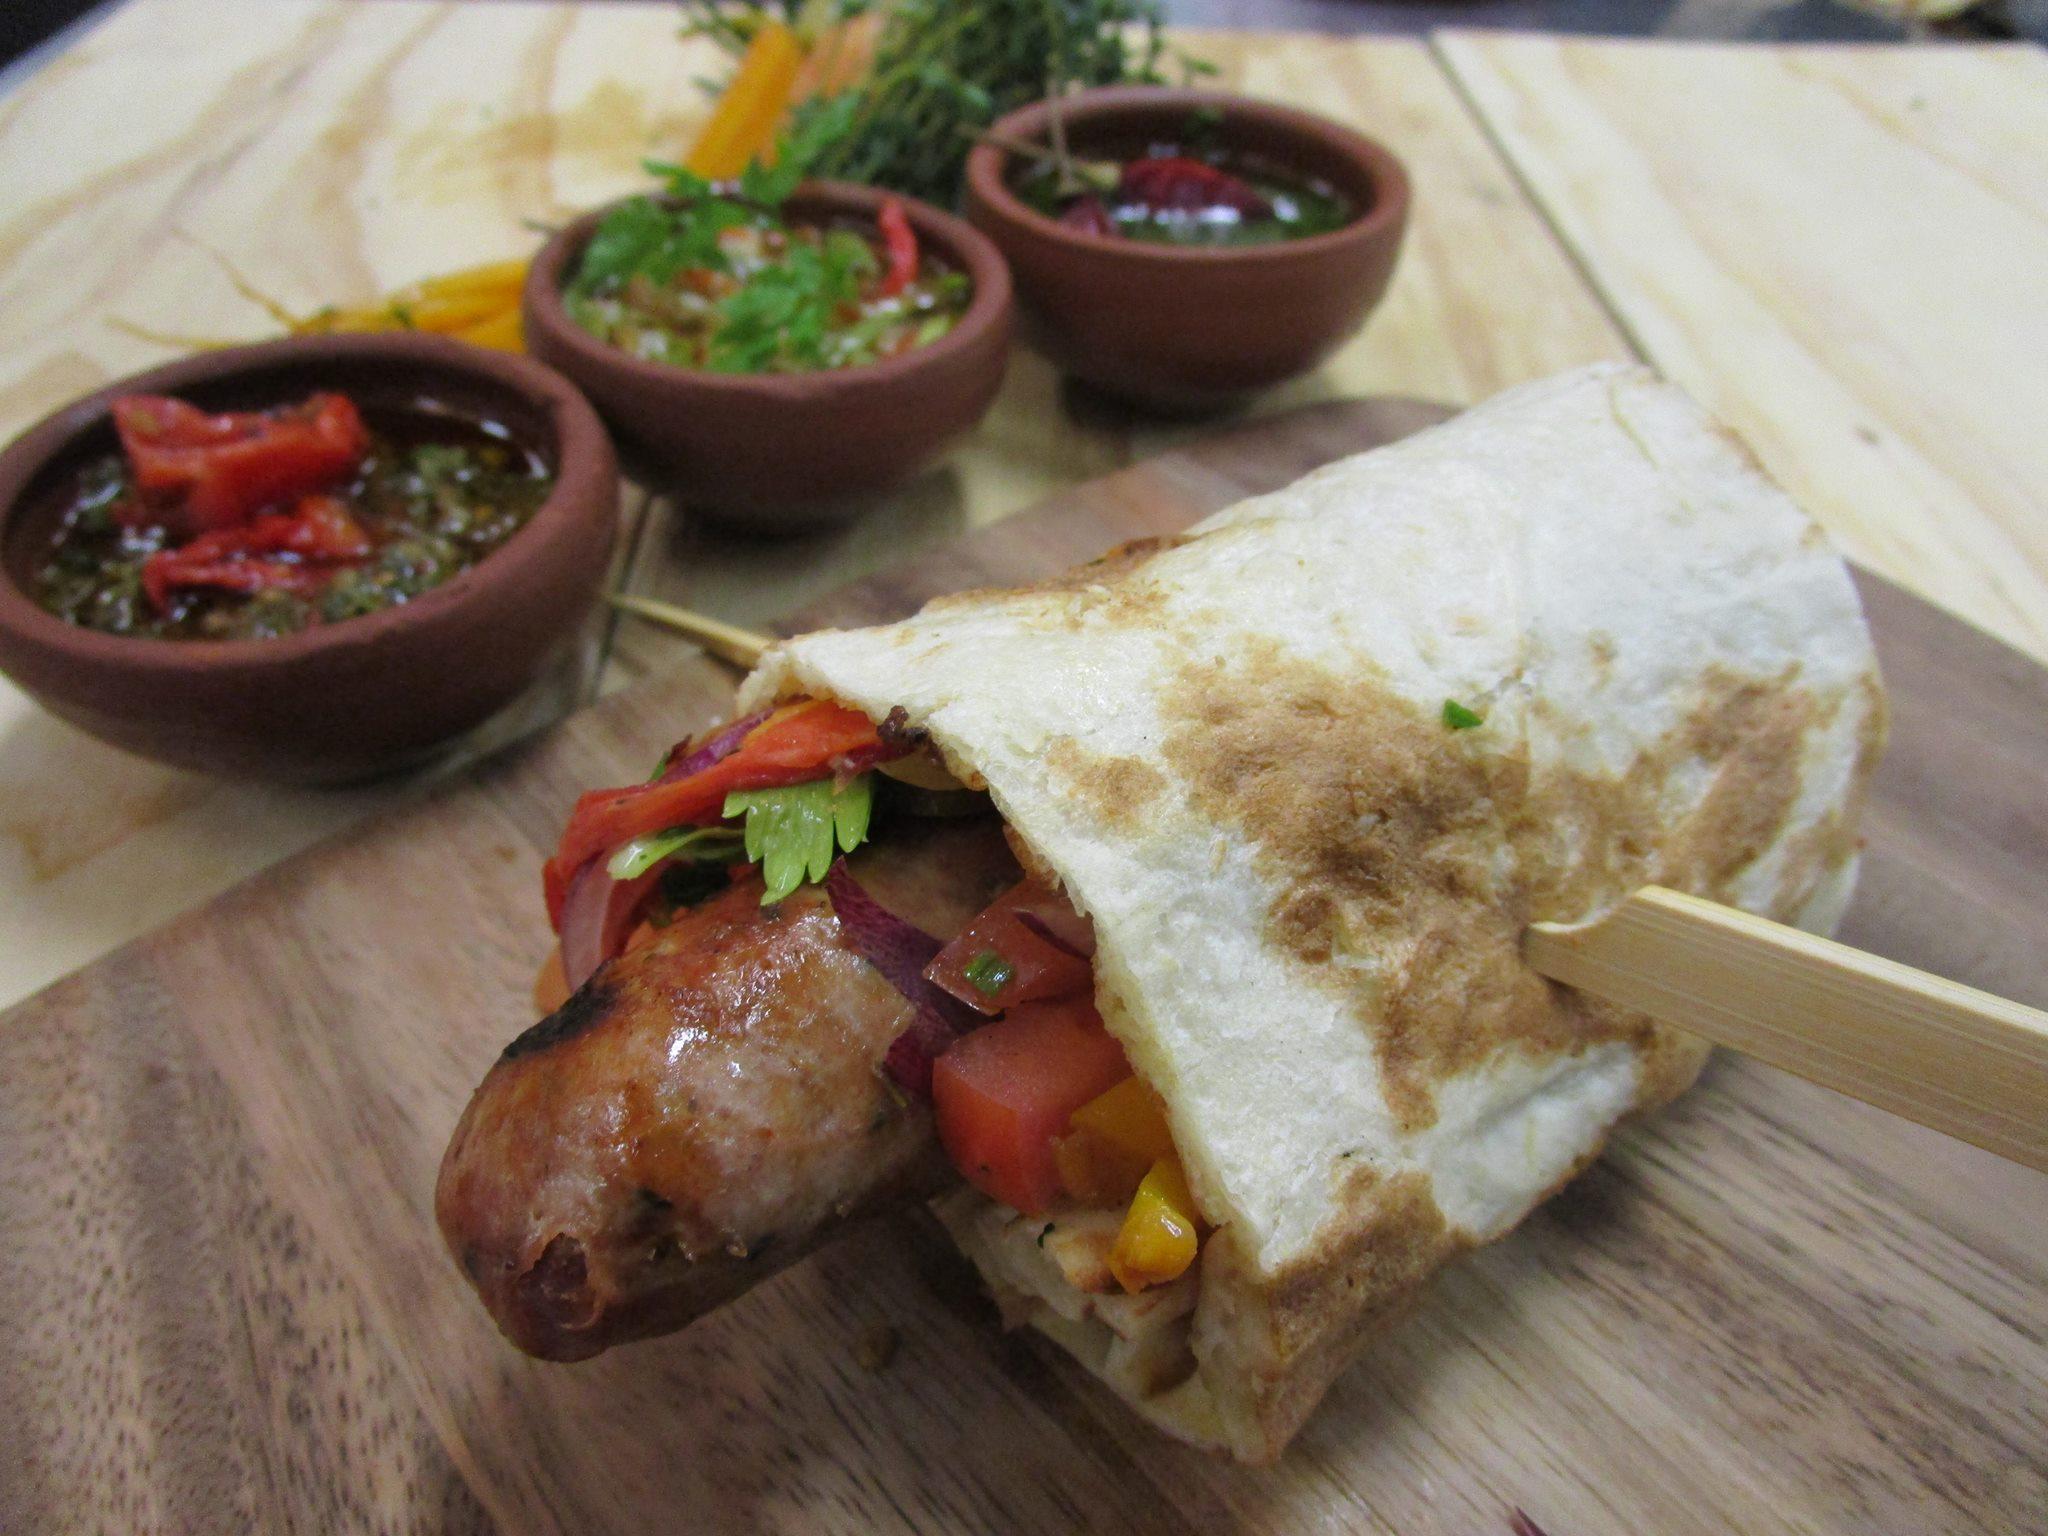 Gallery la boca bar and grill argentinian restaurant for Bar food la menu